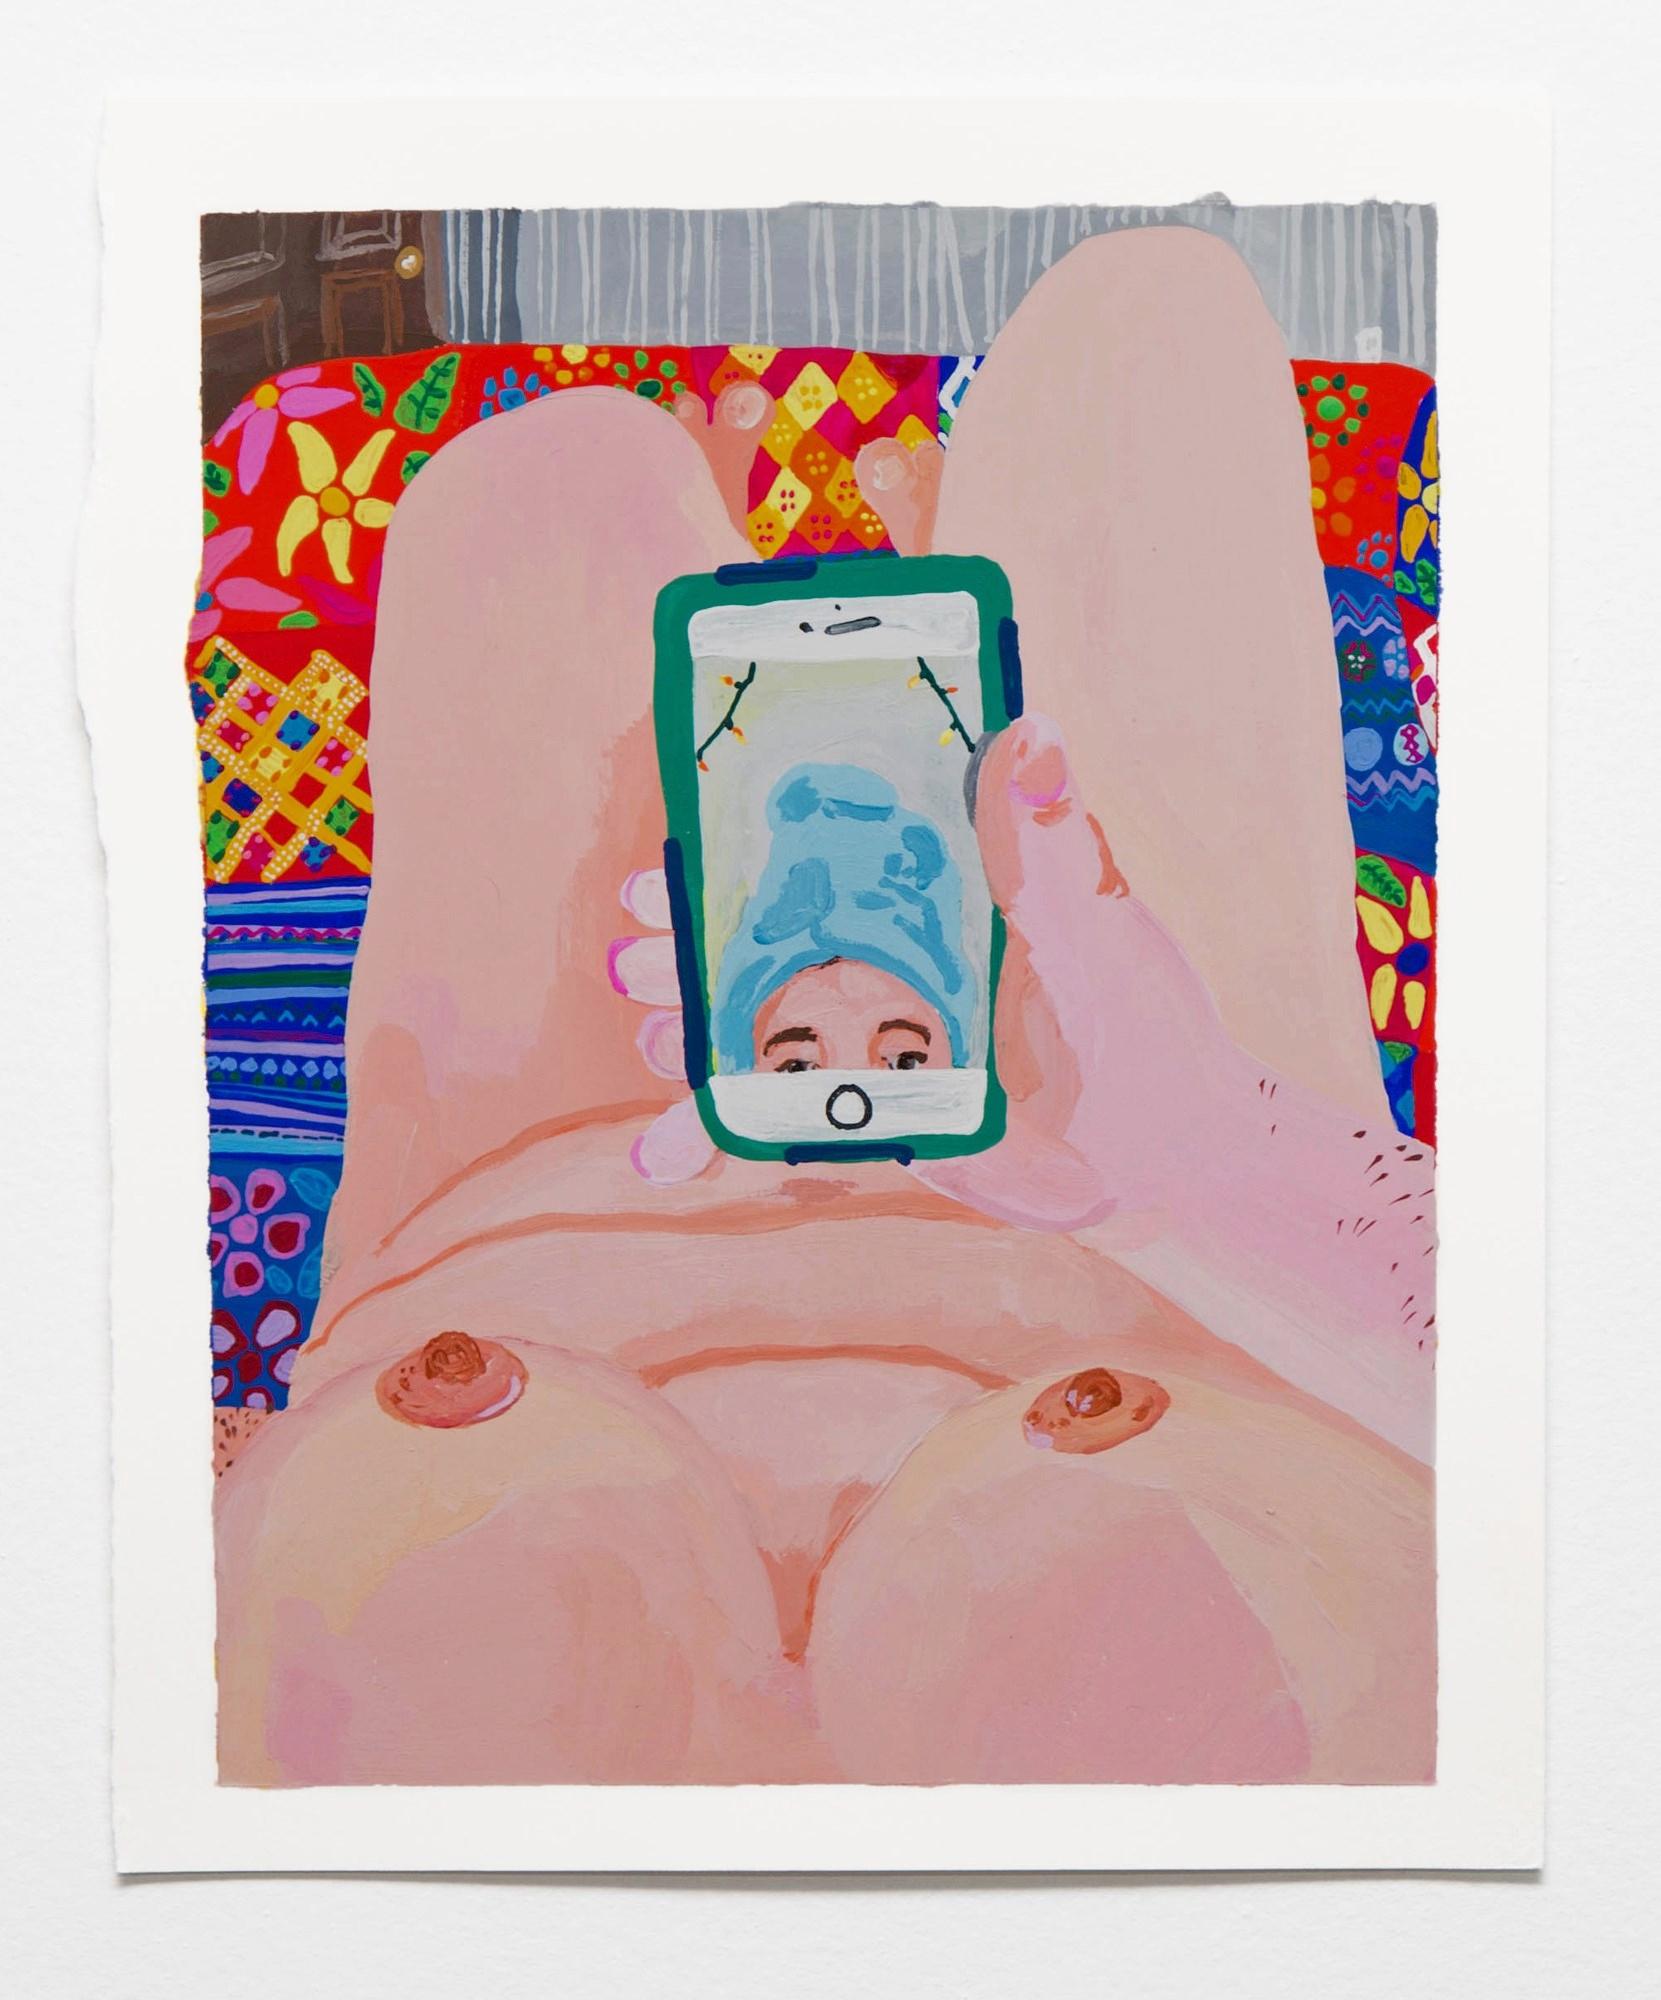 Sarah Treharne,  Getting Ready for work like , 2016, Gouache, 11 x 9 inches